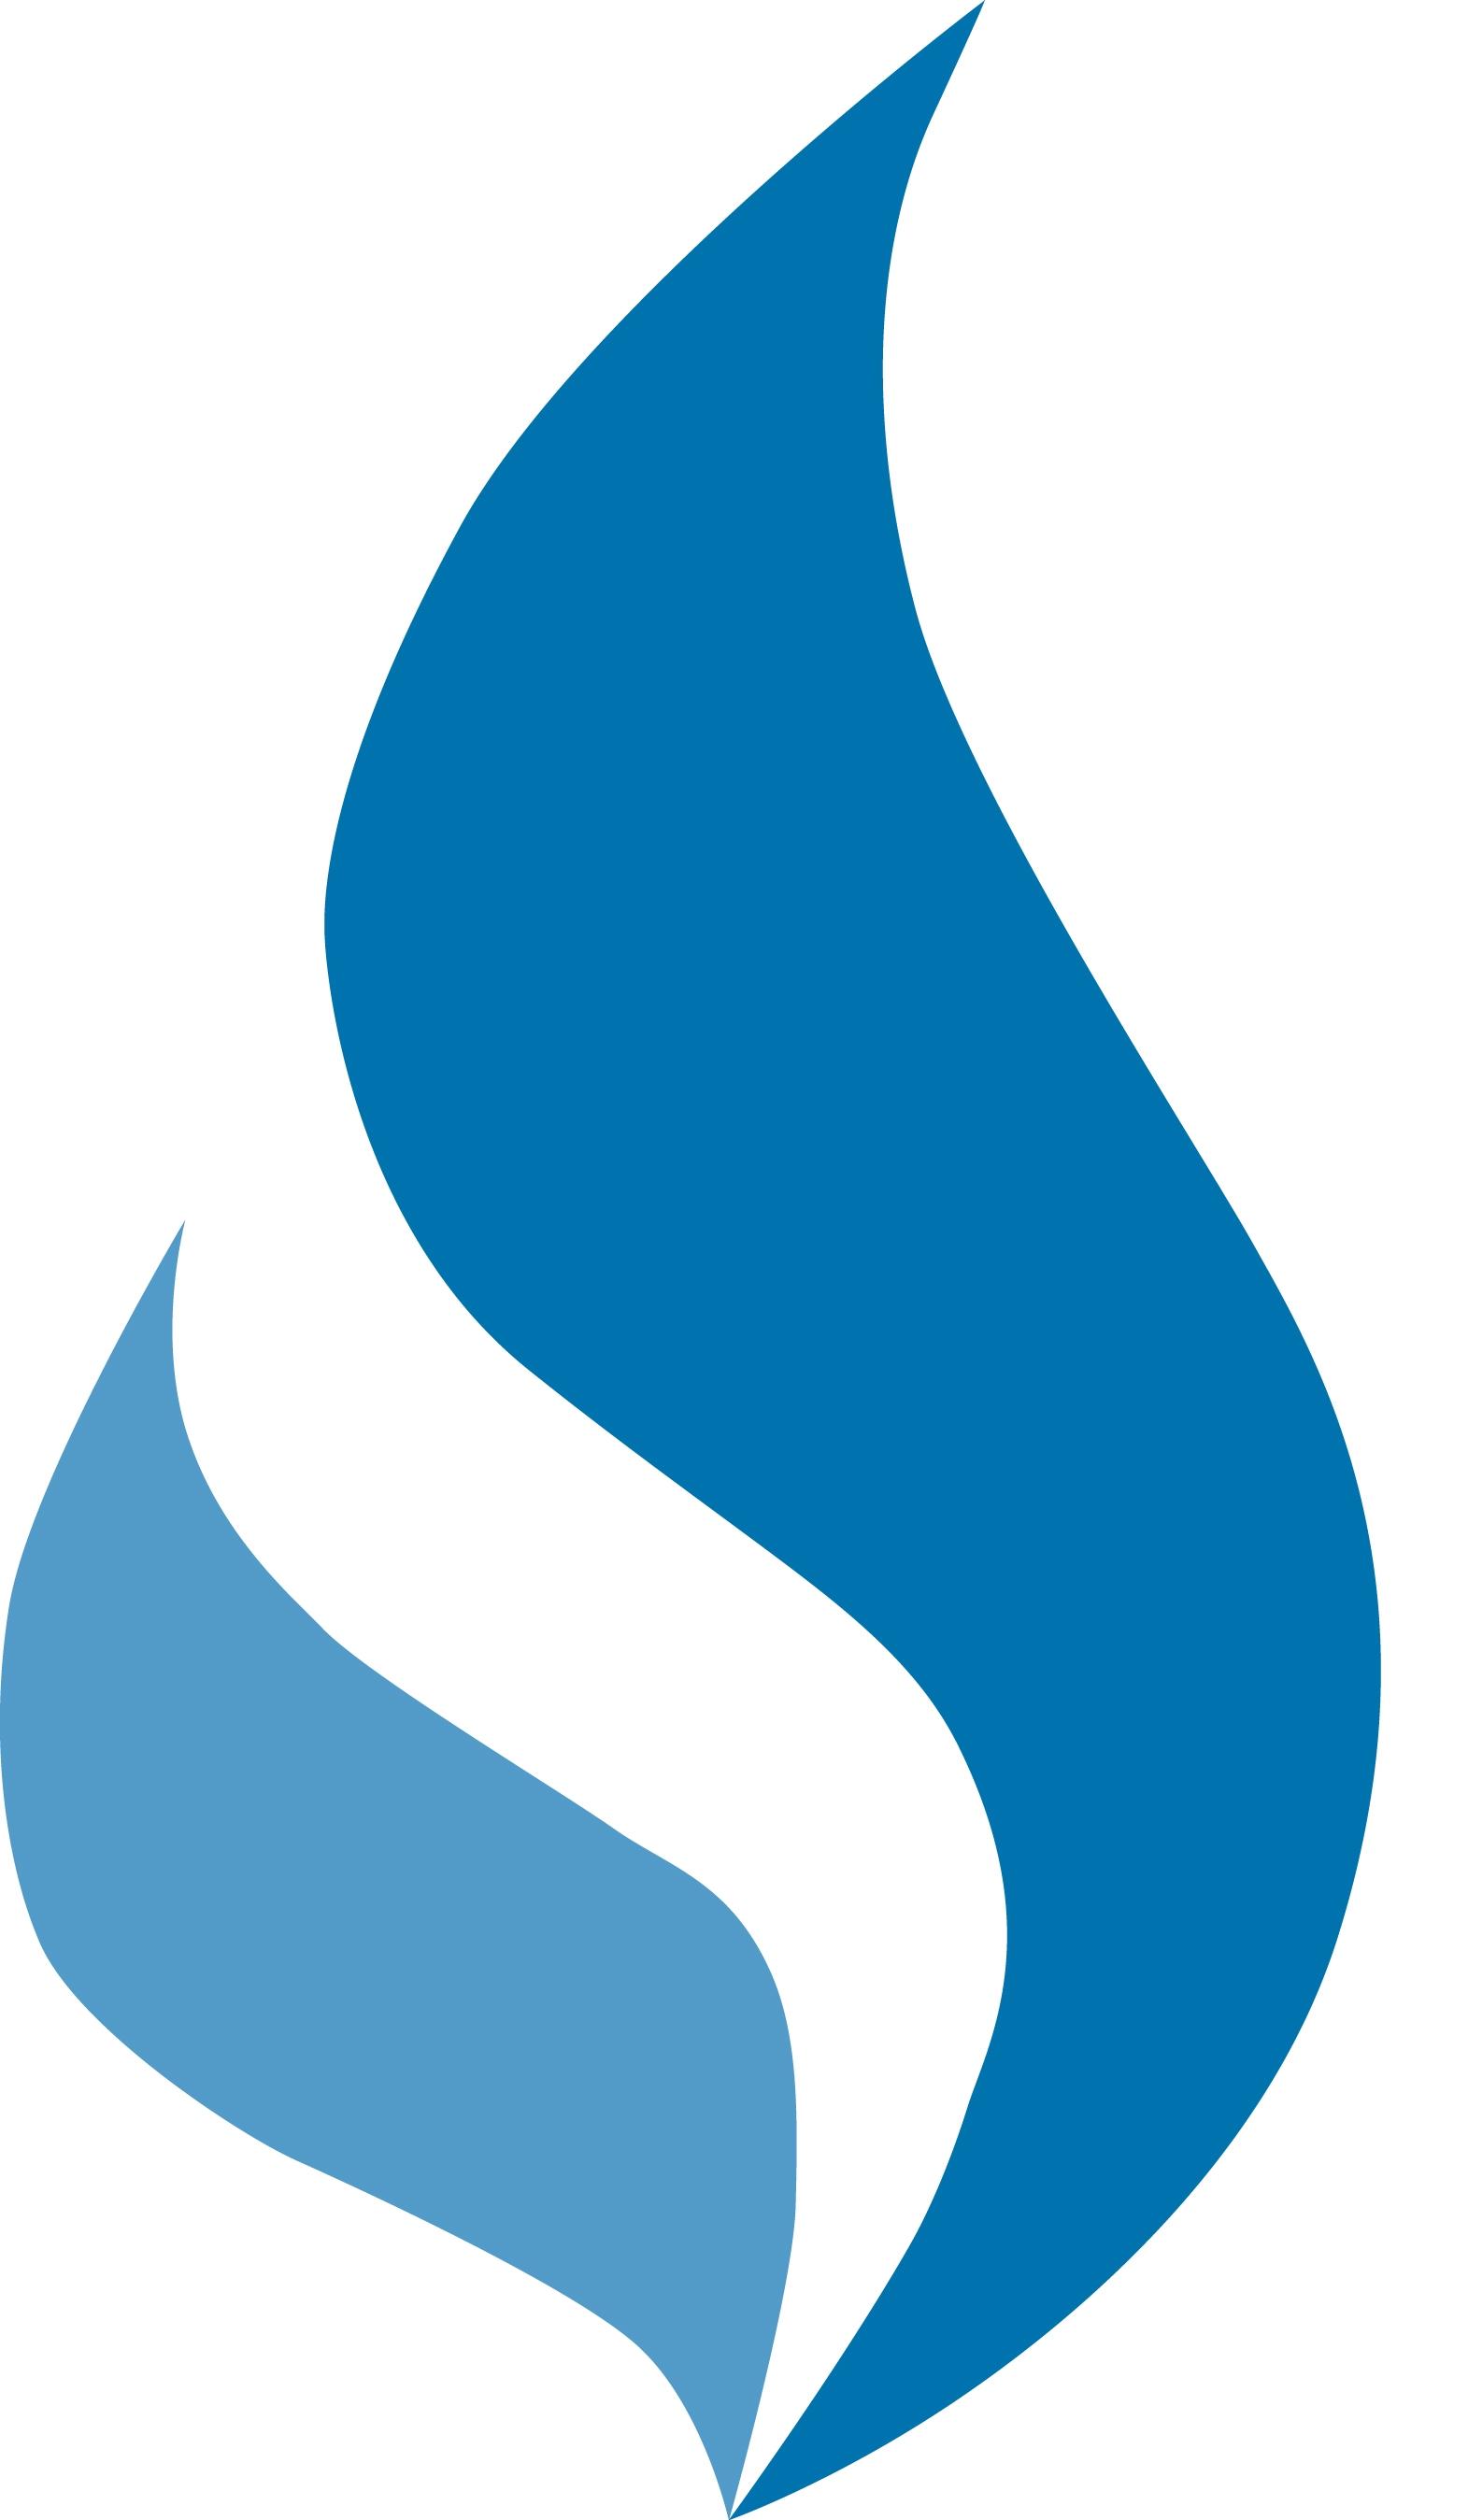 clipart logo - photo #40